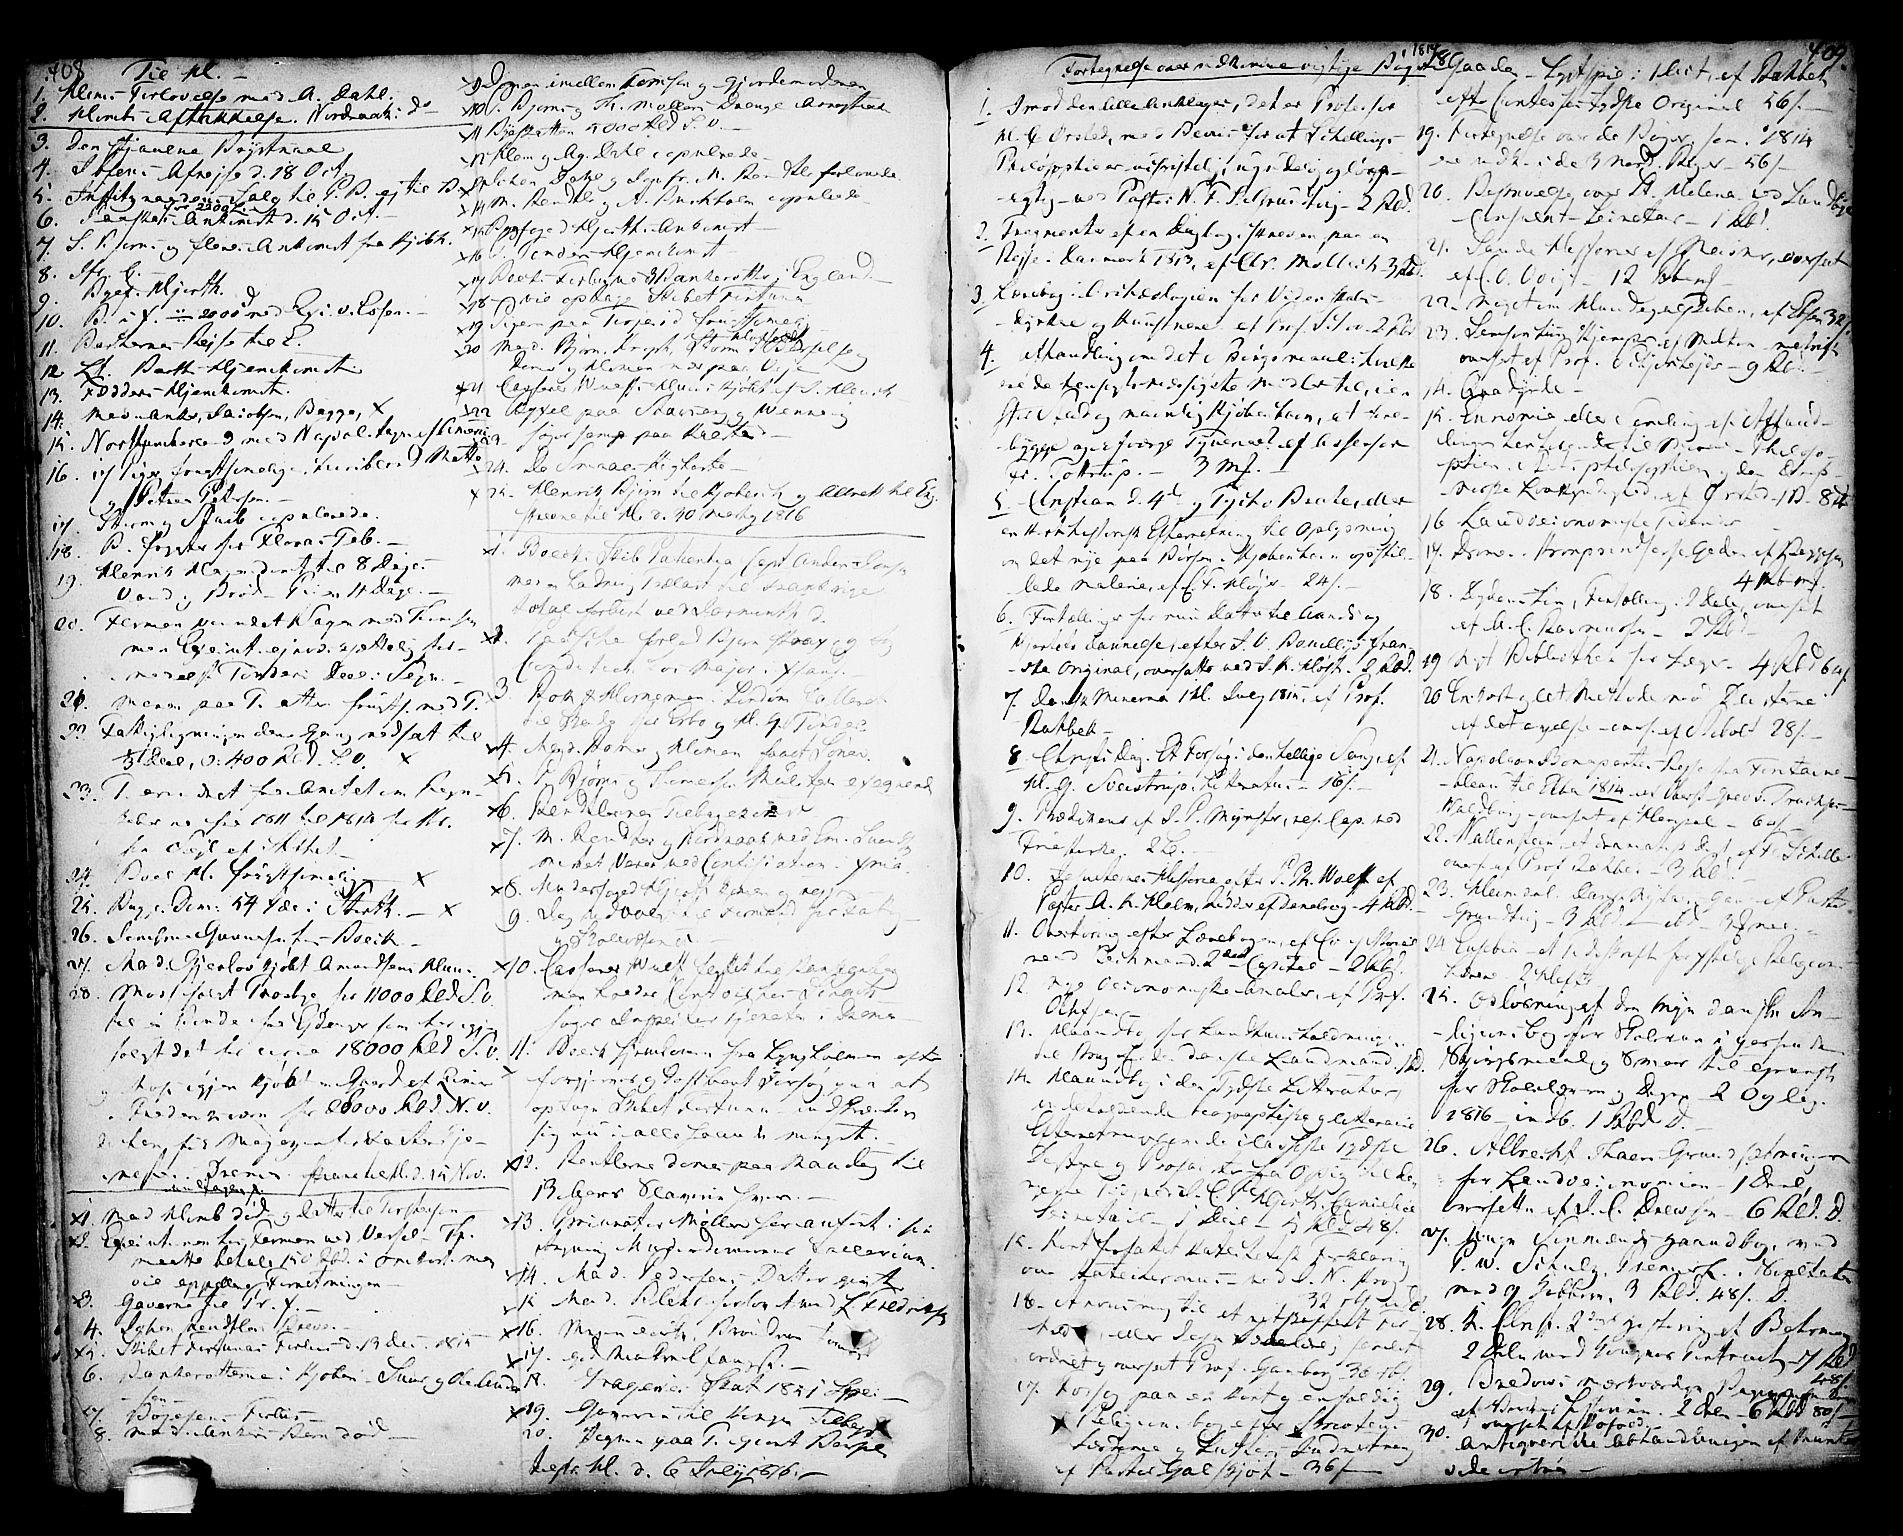 SAKO, Kragerø kirkebøker, F/Fa/L0001: Ministerialbok nr. 1, 1702-1766, s. 408-409